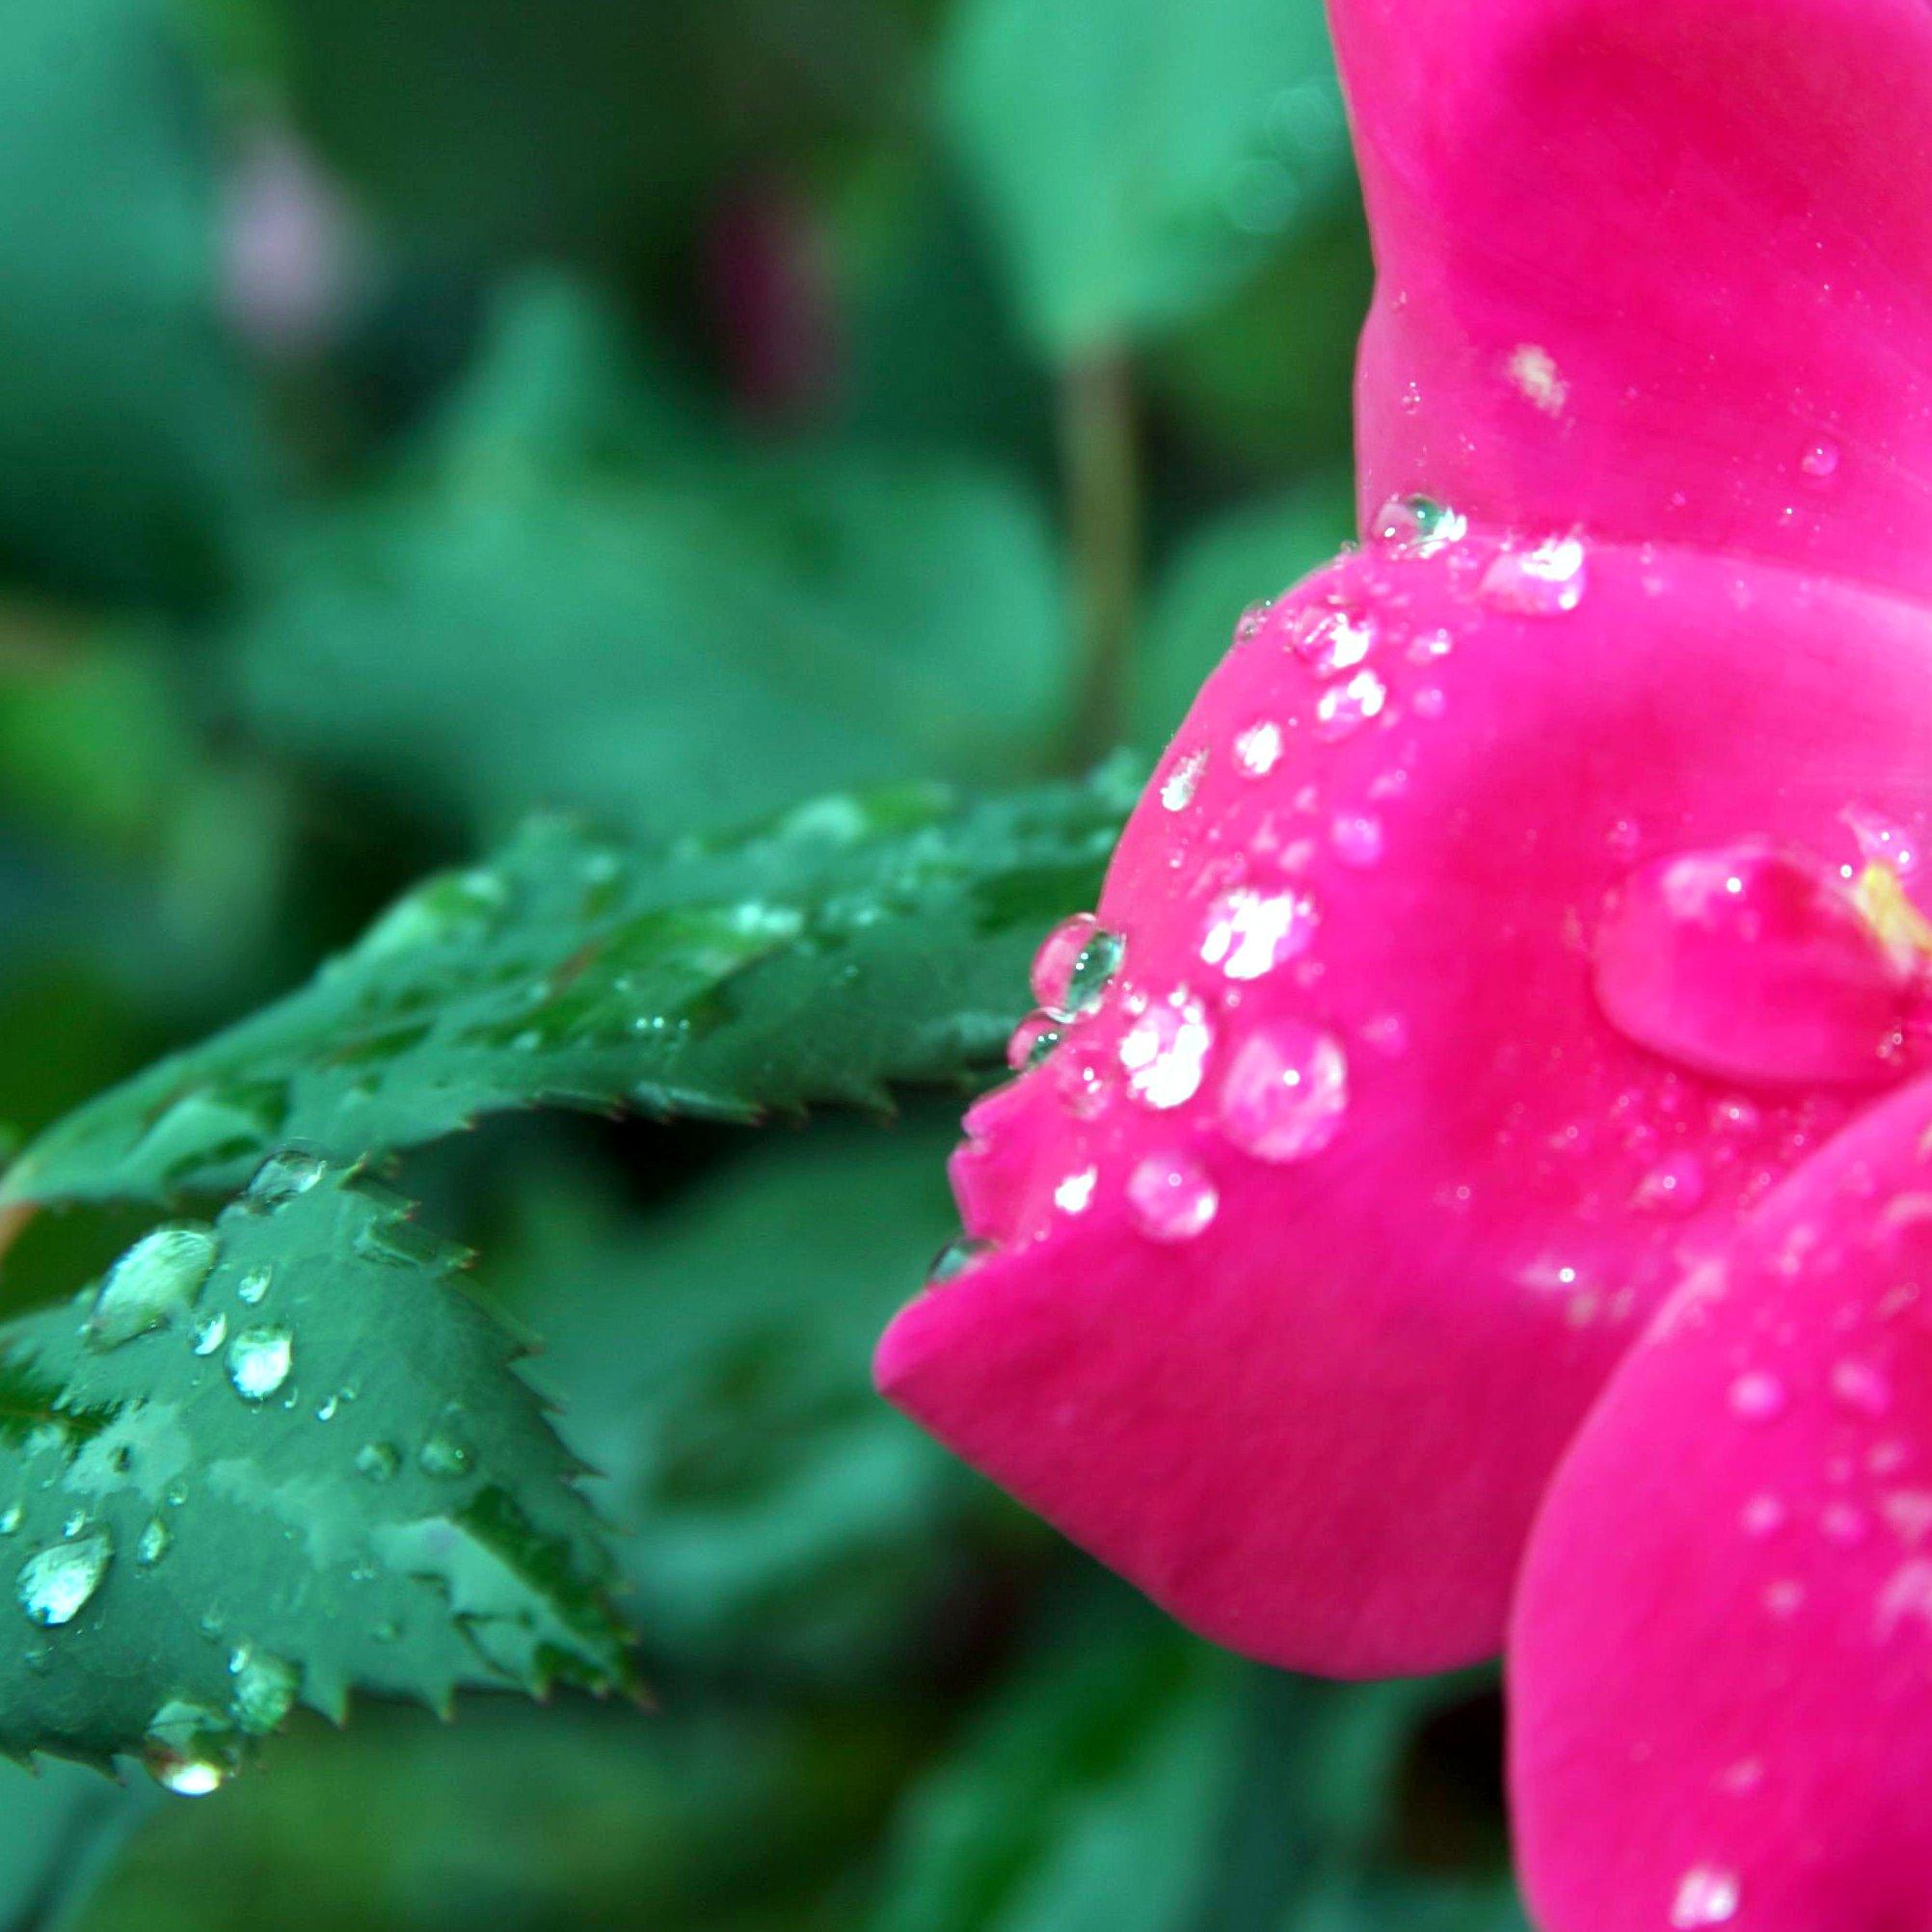 wet-rose